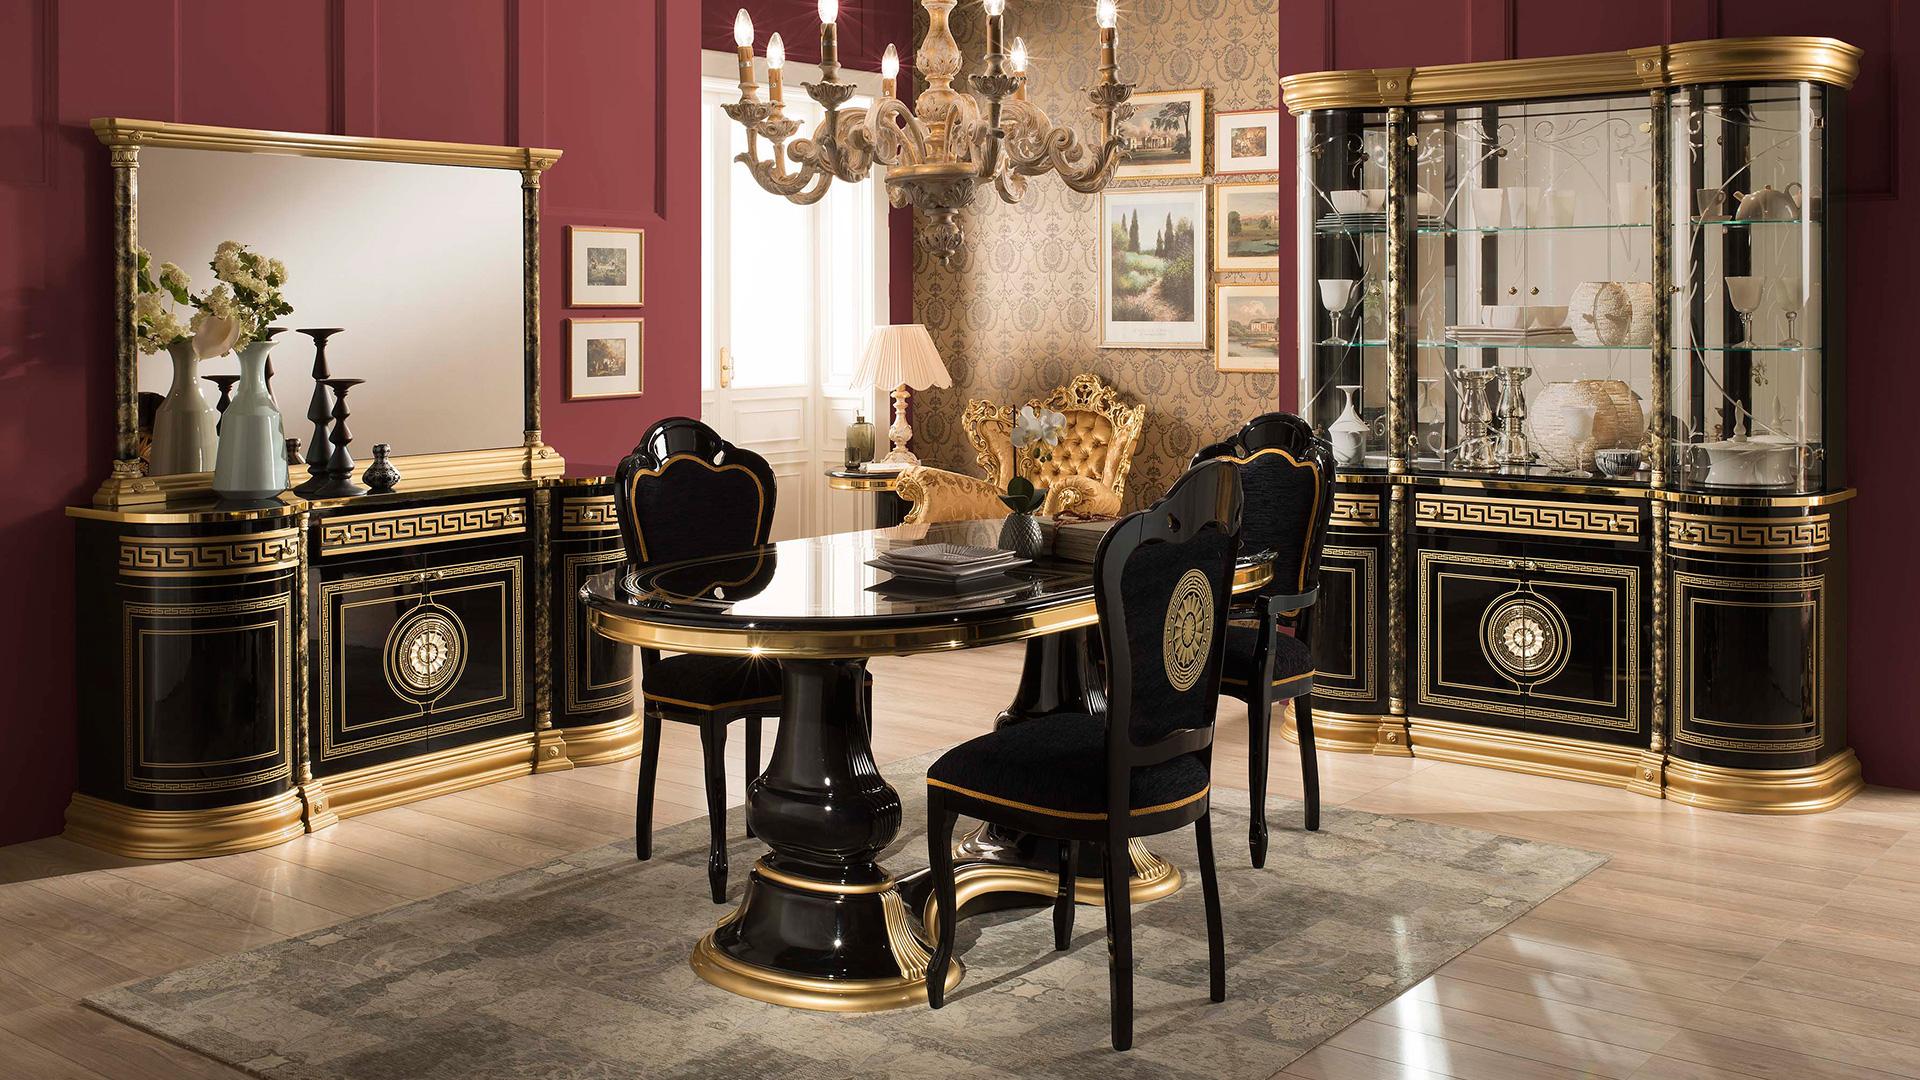 ven s klassische esszimmer yuvam m belhaus in wuppertal cilek offizieller h ndler in europa. Black Bedroom Furniture Sets. Home Design Ideas